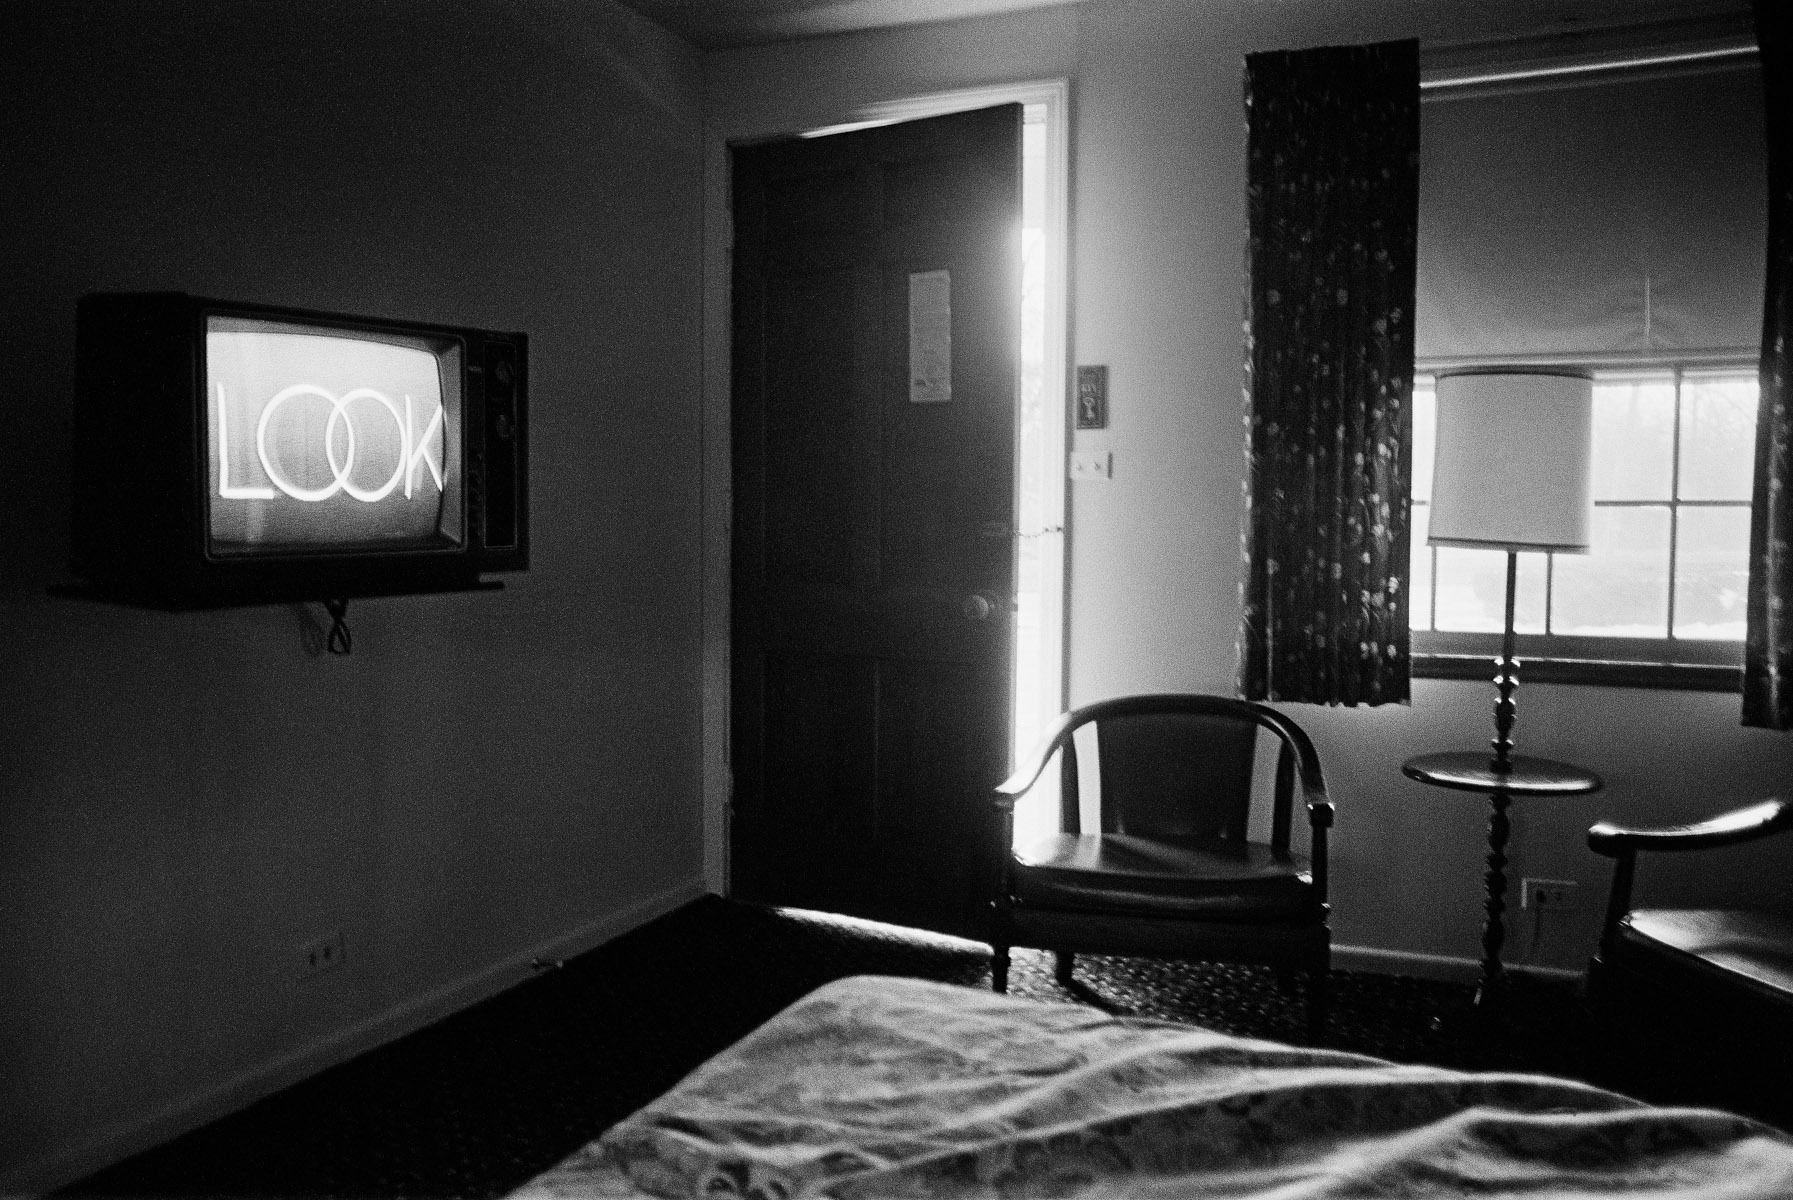 Motel, Highland Park, IL, 1989